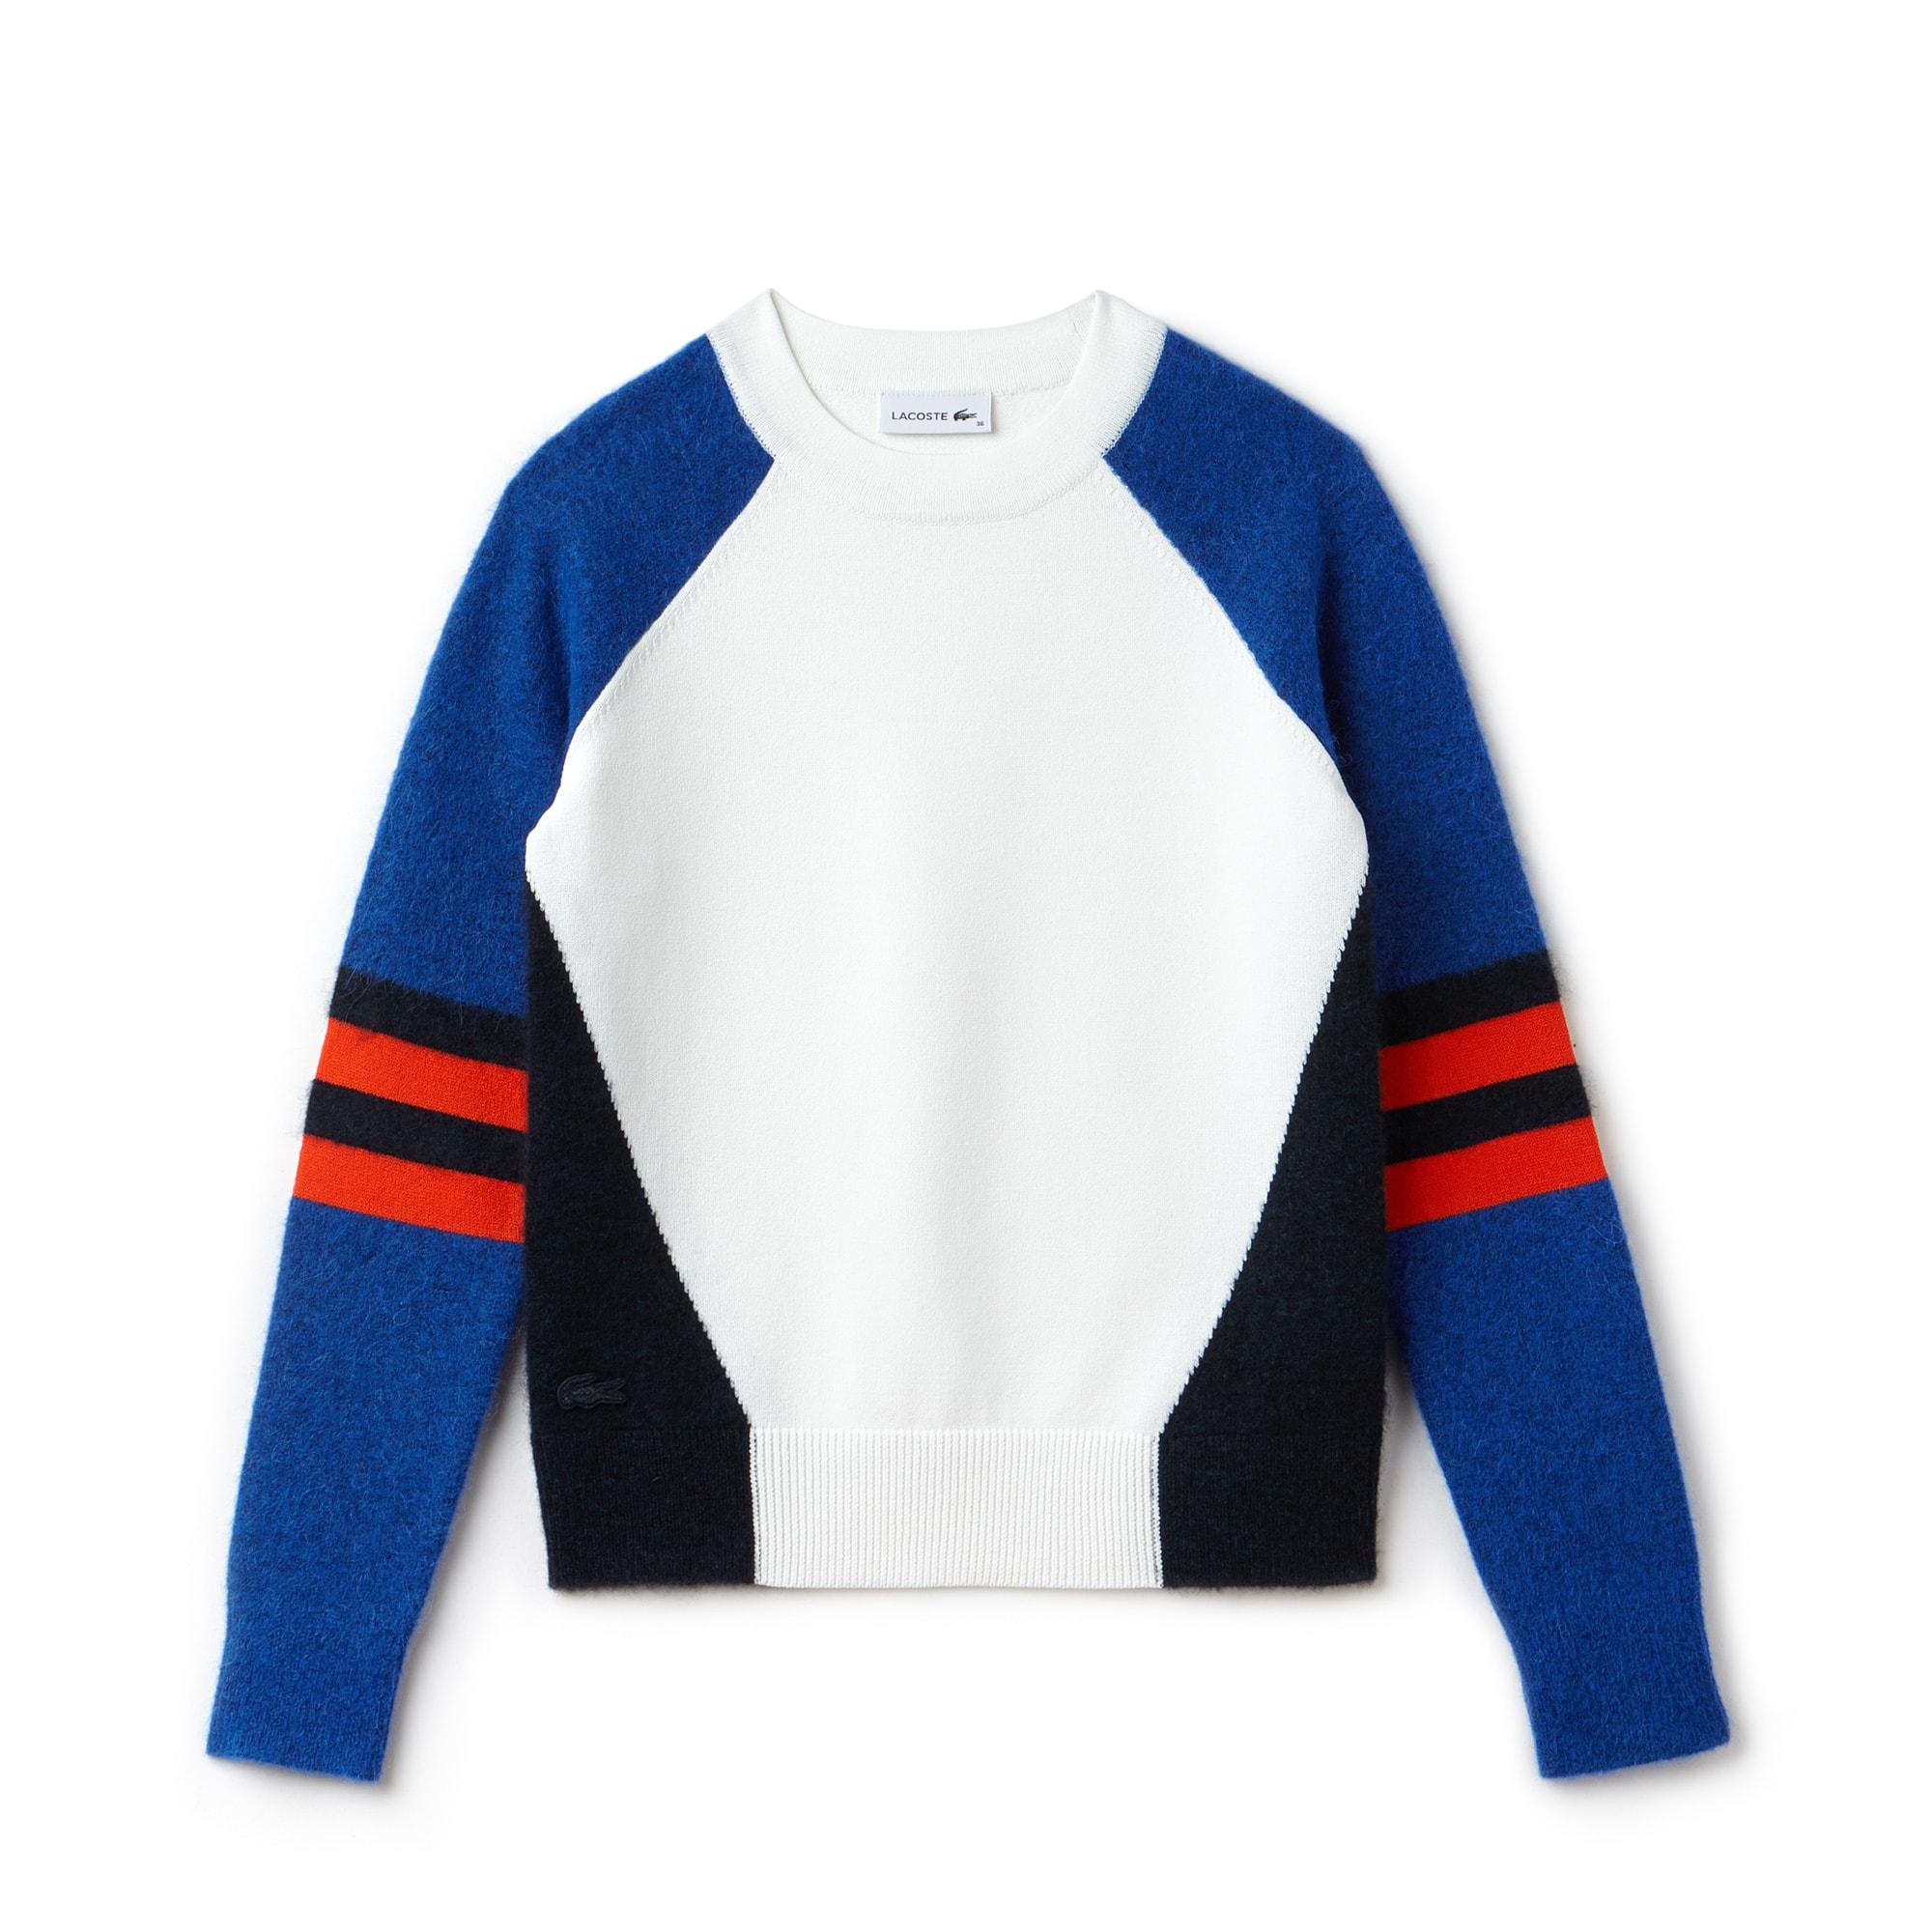 Camisola decote redondo em jersey de lã e alpaca color block